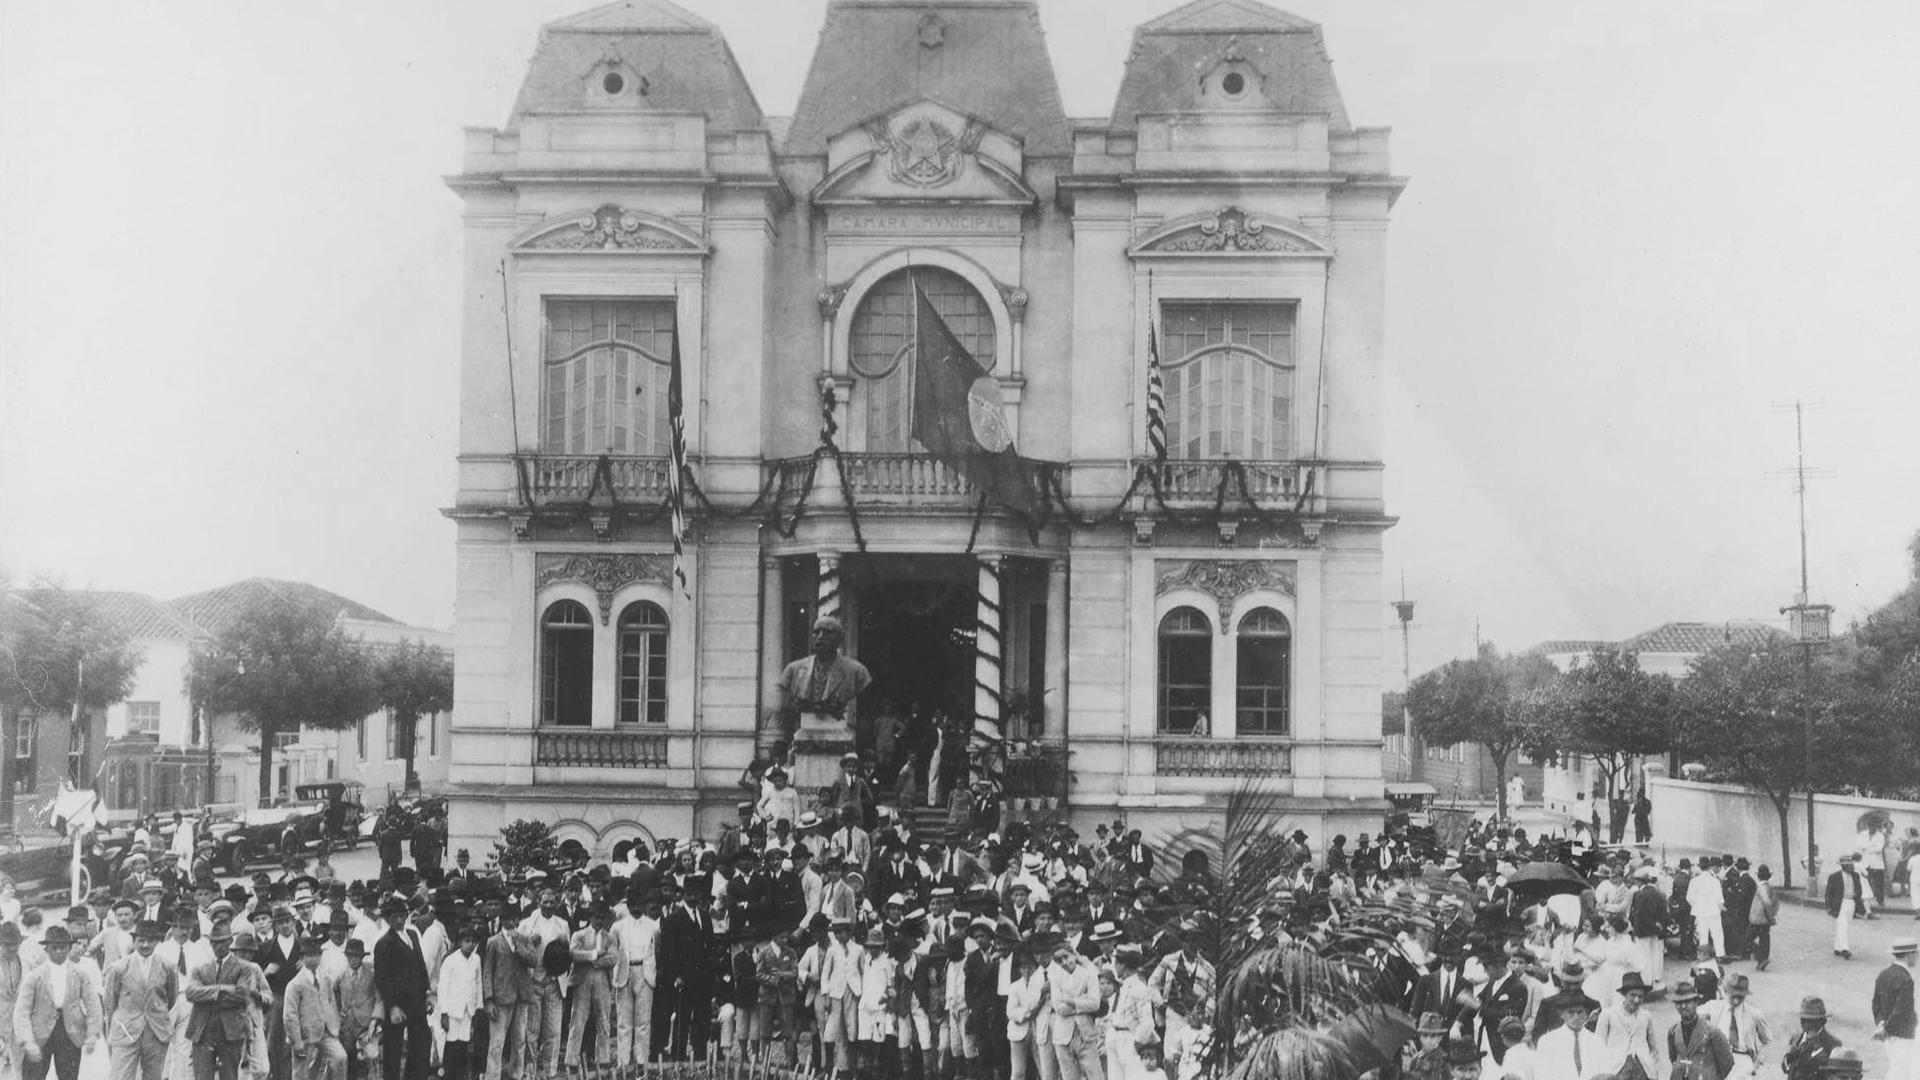 Washington Luís visita o Palacete Prates, na época sede da Câmara Municipal